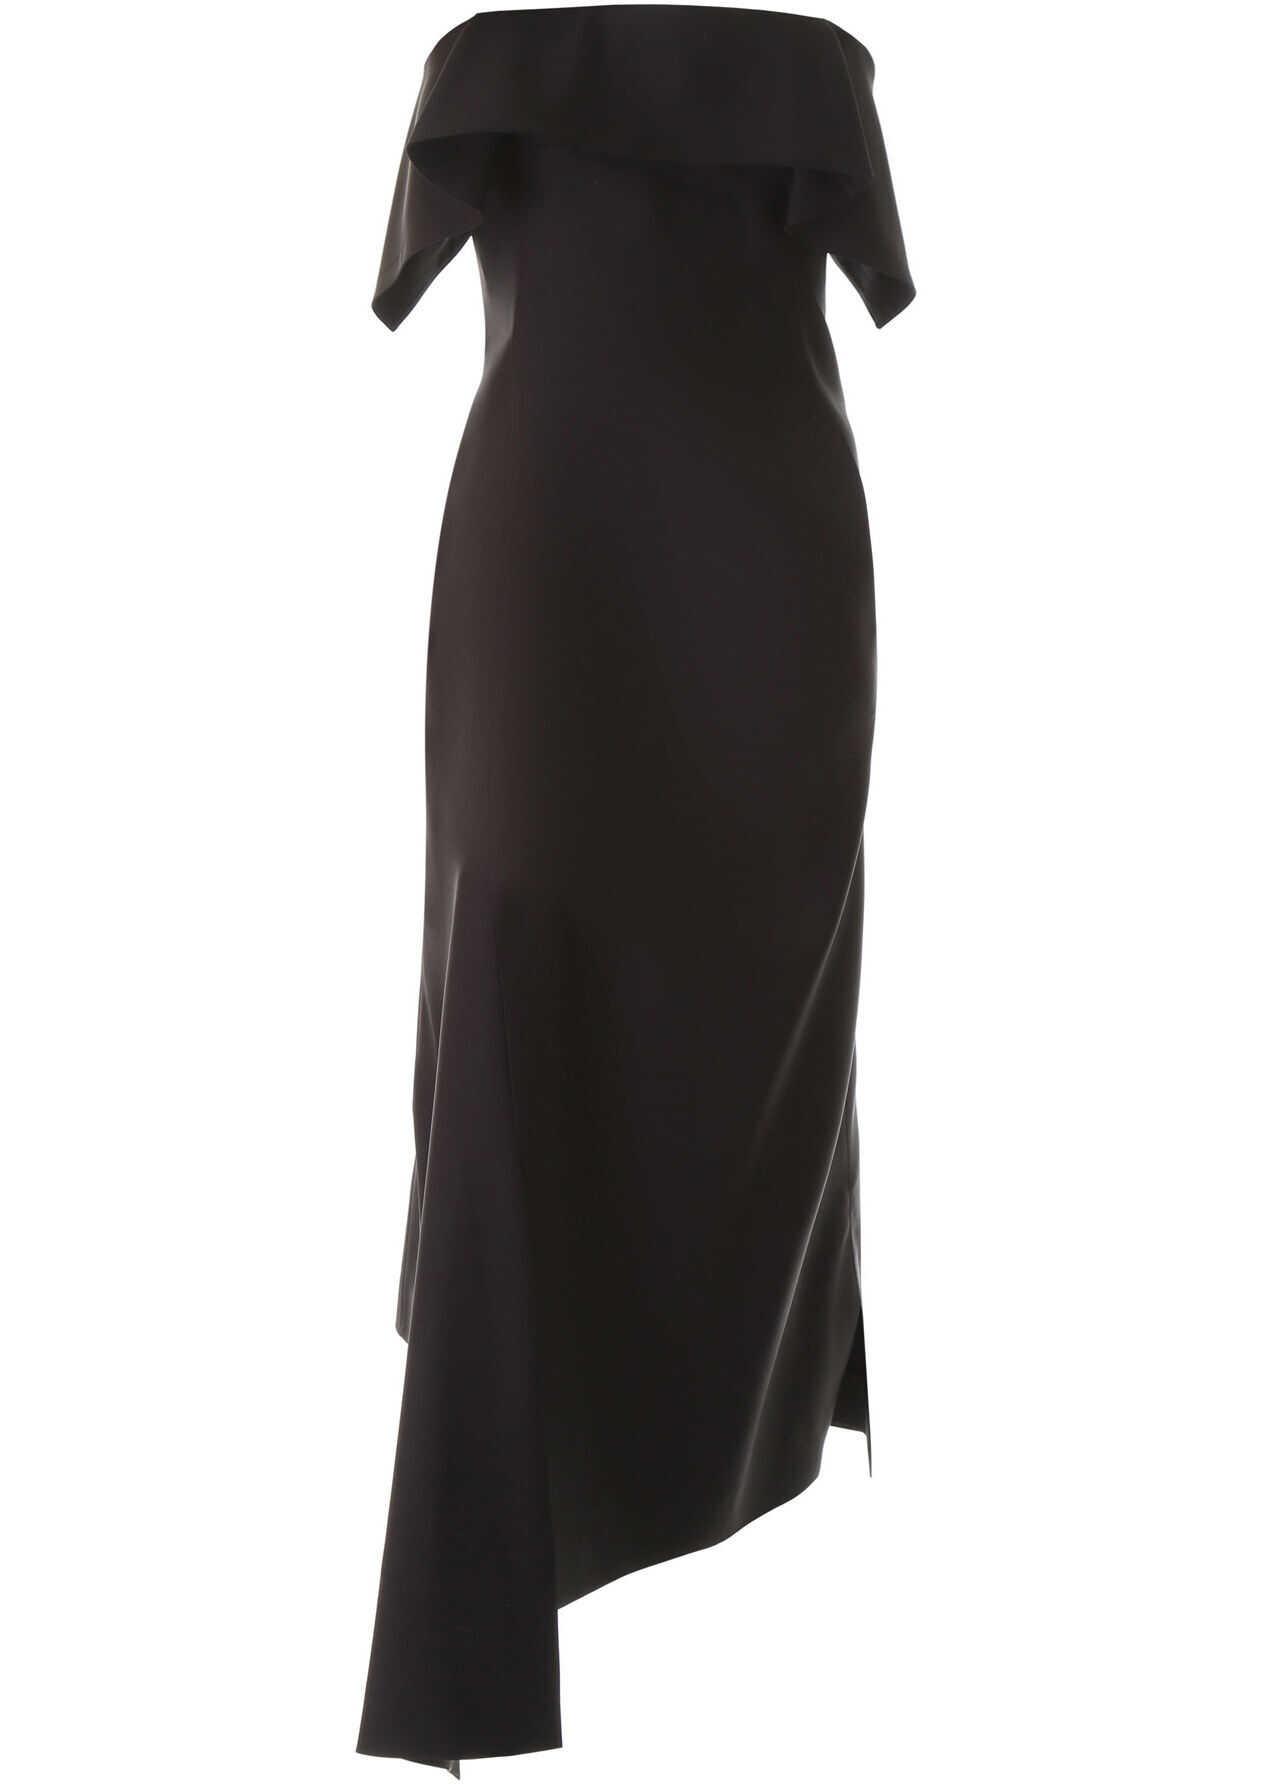 Lanvin Asymmetrical Bustier Dress BLACK